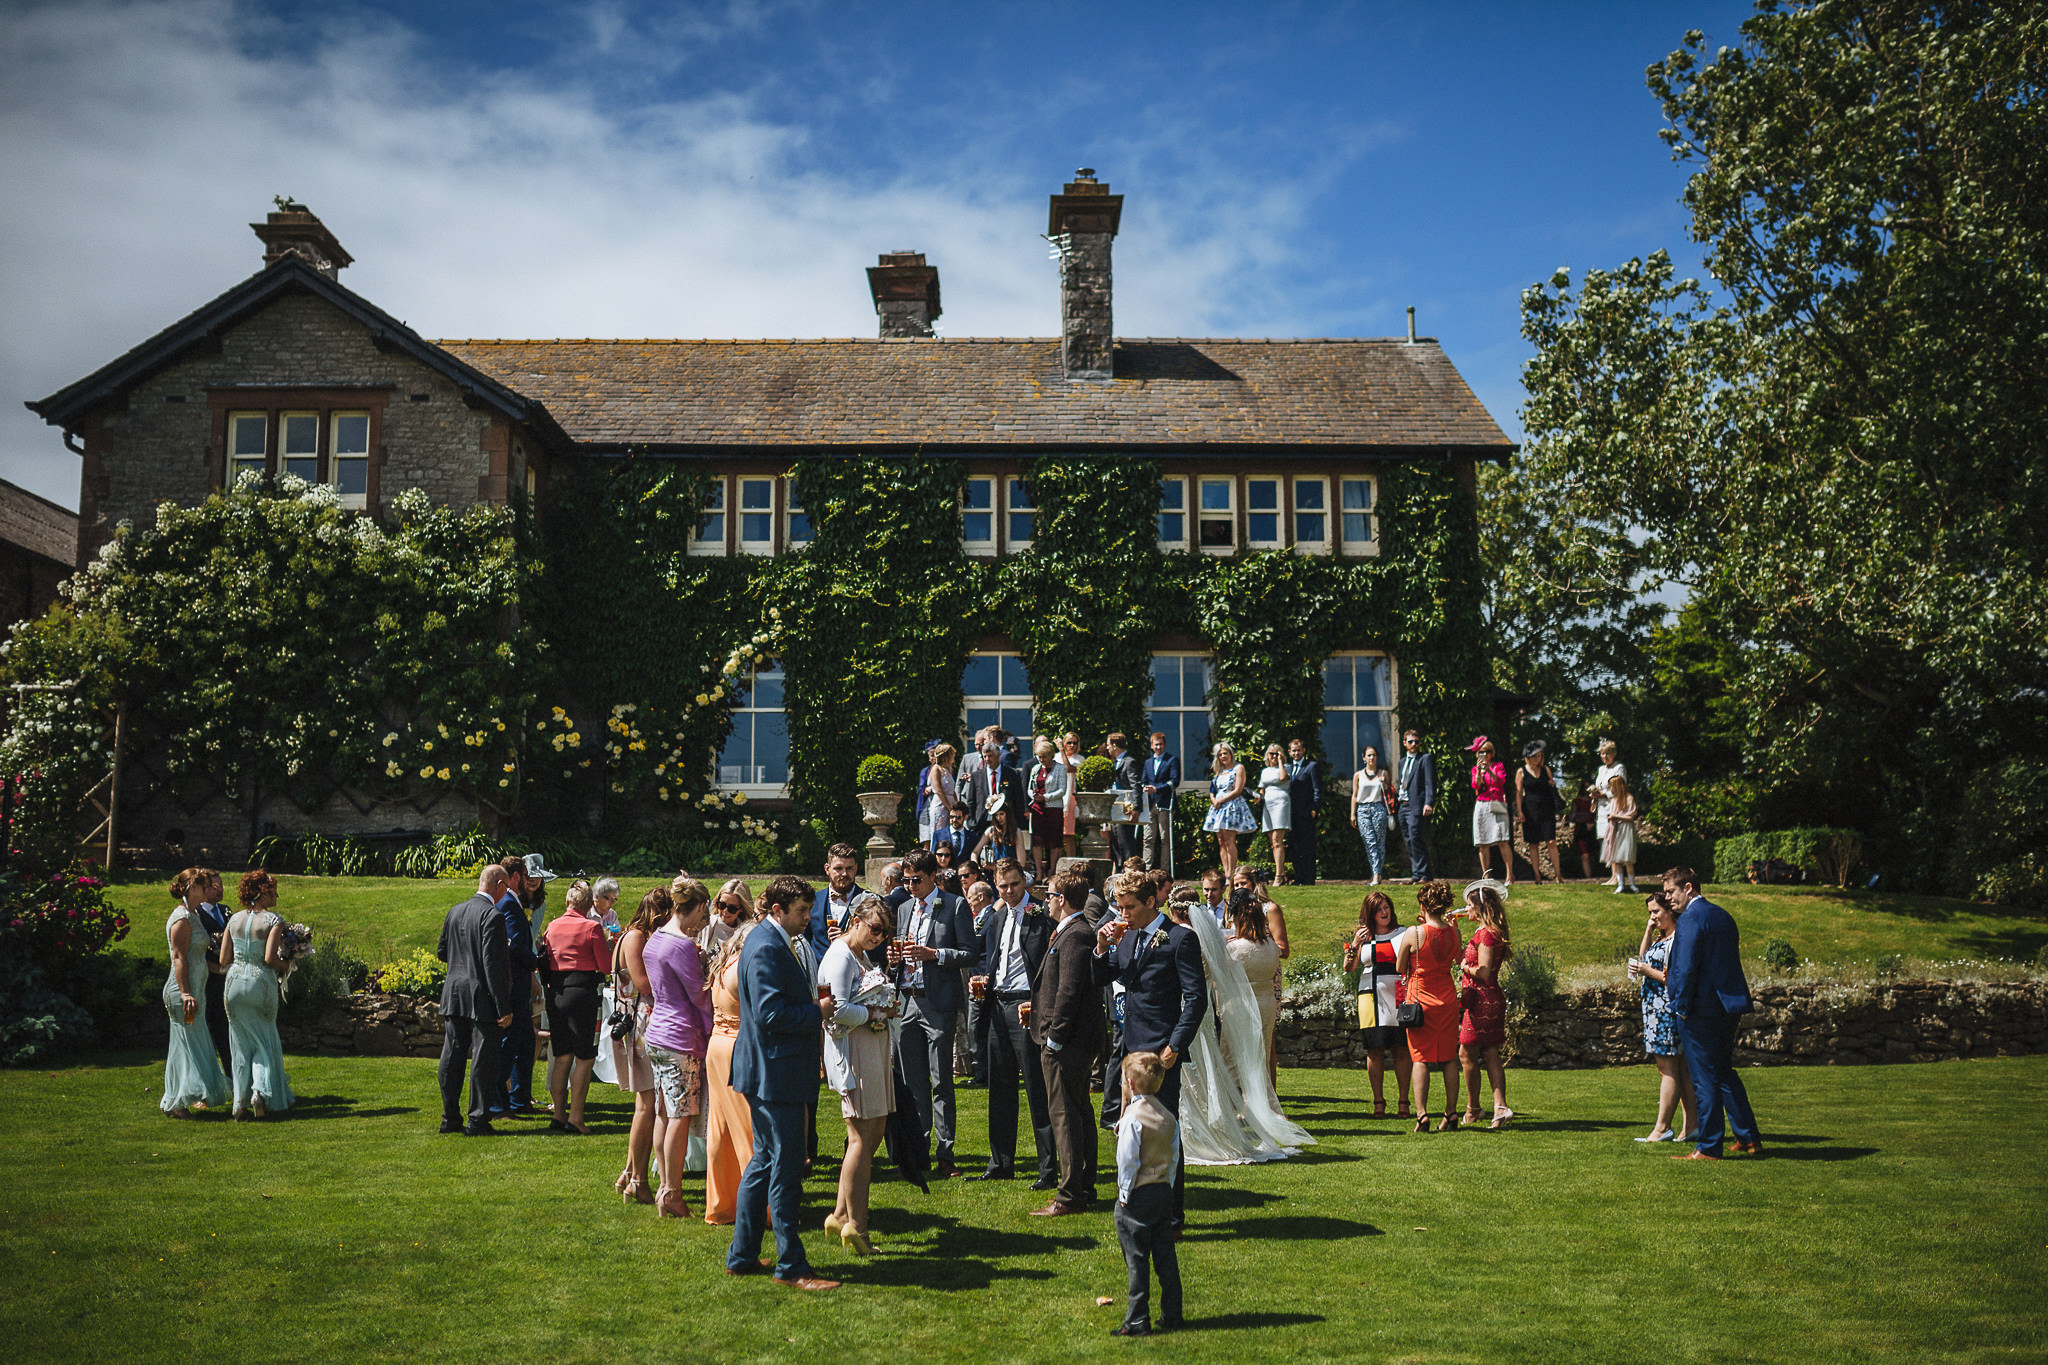 paul-marbrook-Farm-Wedding-Photographer-Lancashire-90039